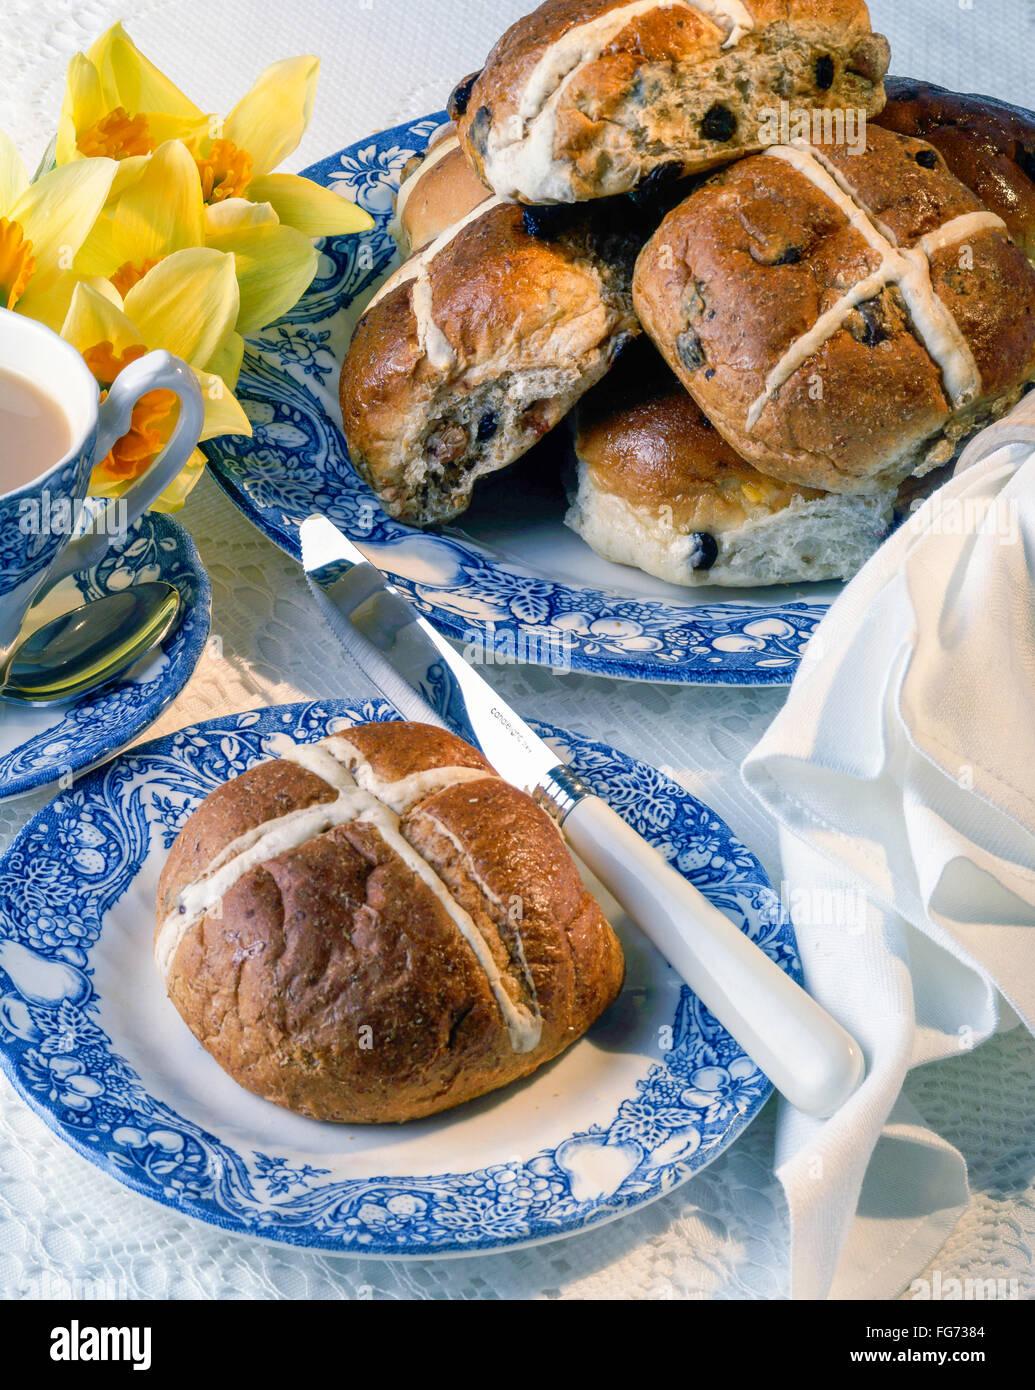 Hot Cross Buns auf Teller mit Messer und Tee in Studioumgebung Stockbild